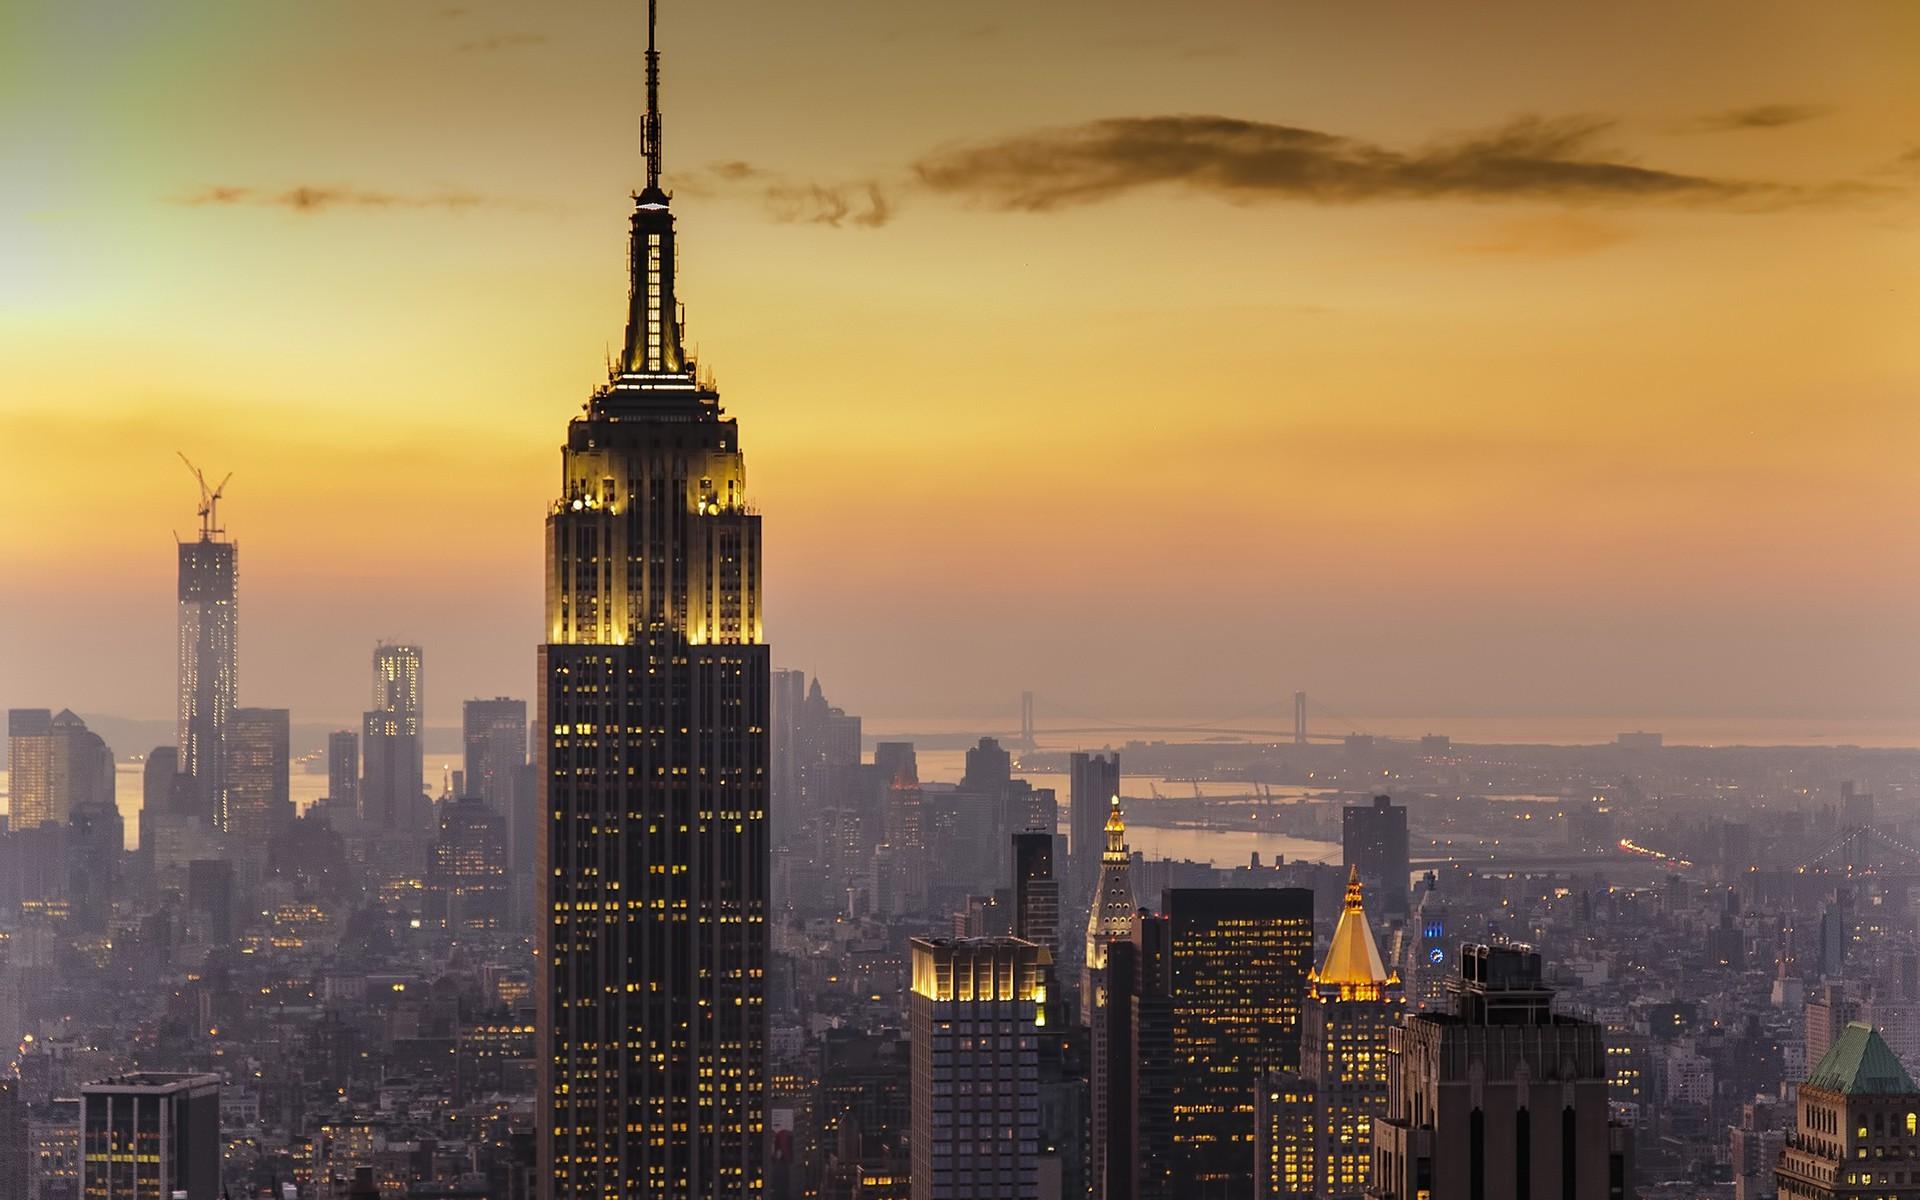 Most Inspiring Wallpaper Night Empire State Building - lights-sunset-city-cityscape-night-architecture-building-clouds-sunrise-skyline-skyscraper-evening-morning-tower-bridge-river-New-York-City-horizon-USA-cranes-machine-dusk-Manhattan-metropolis-Empire-State-Building-haze-downtown-dawn-landmark-1920x1200-px-Birds-Eye-View-urban-area-atmospheric-phenomenon-metropolitan-area-human-settlement-593972  Pic-57814.jpg